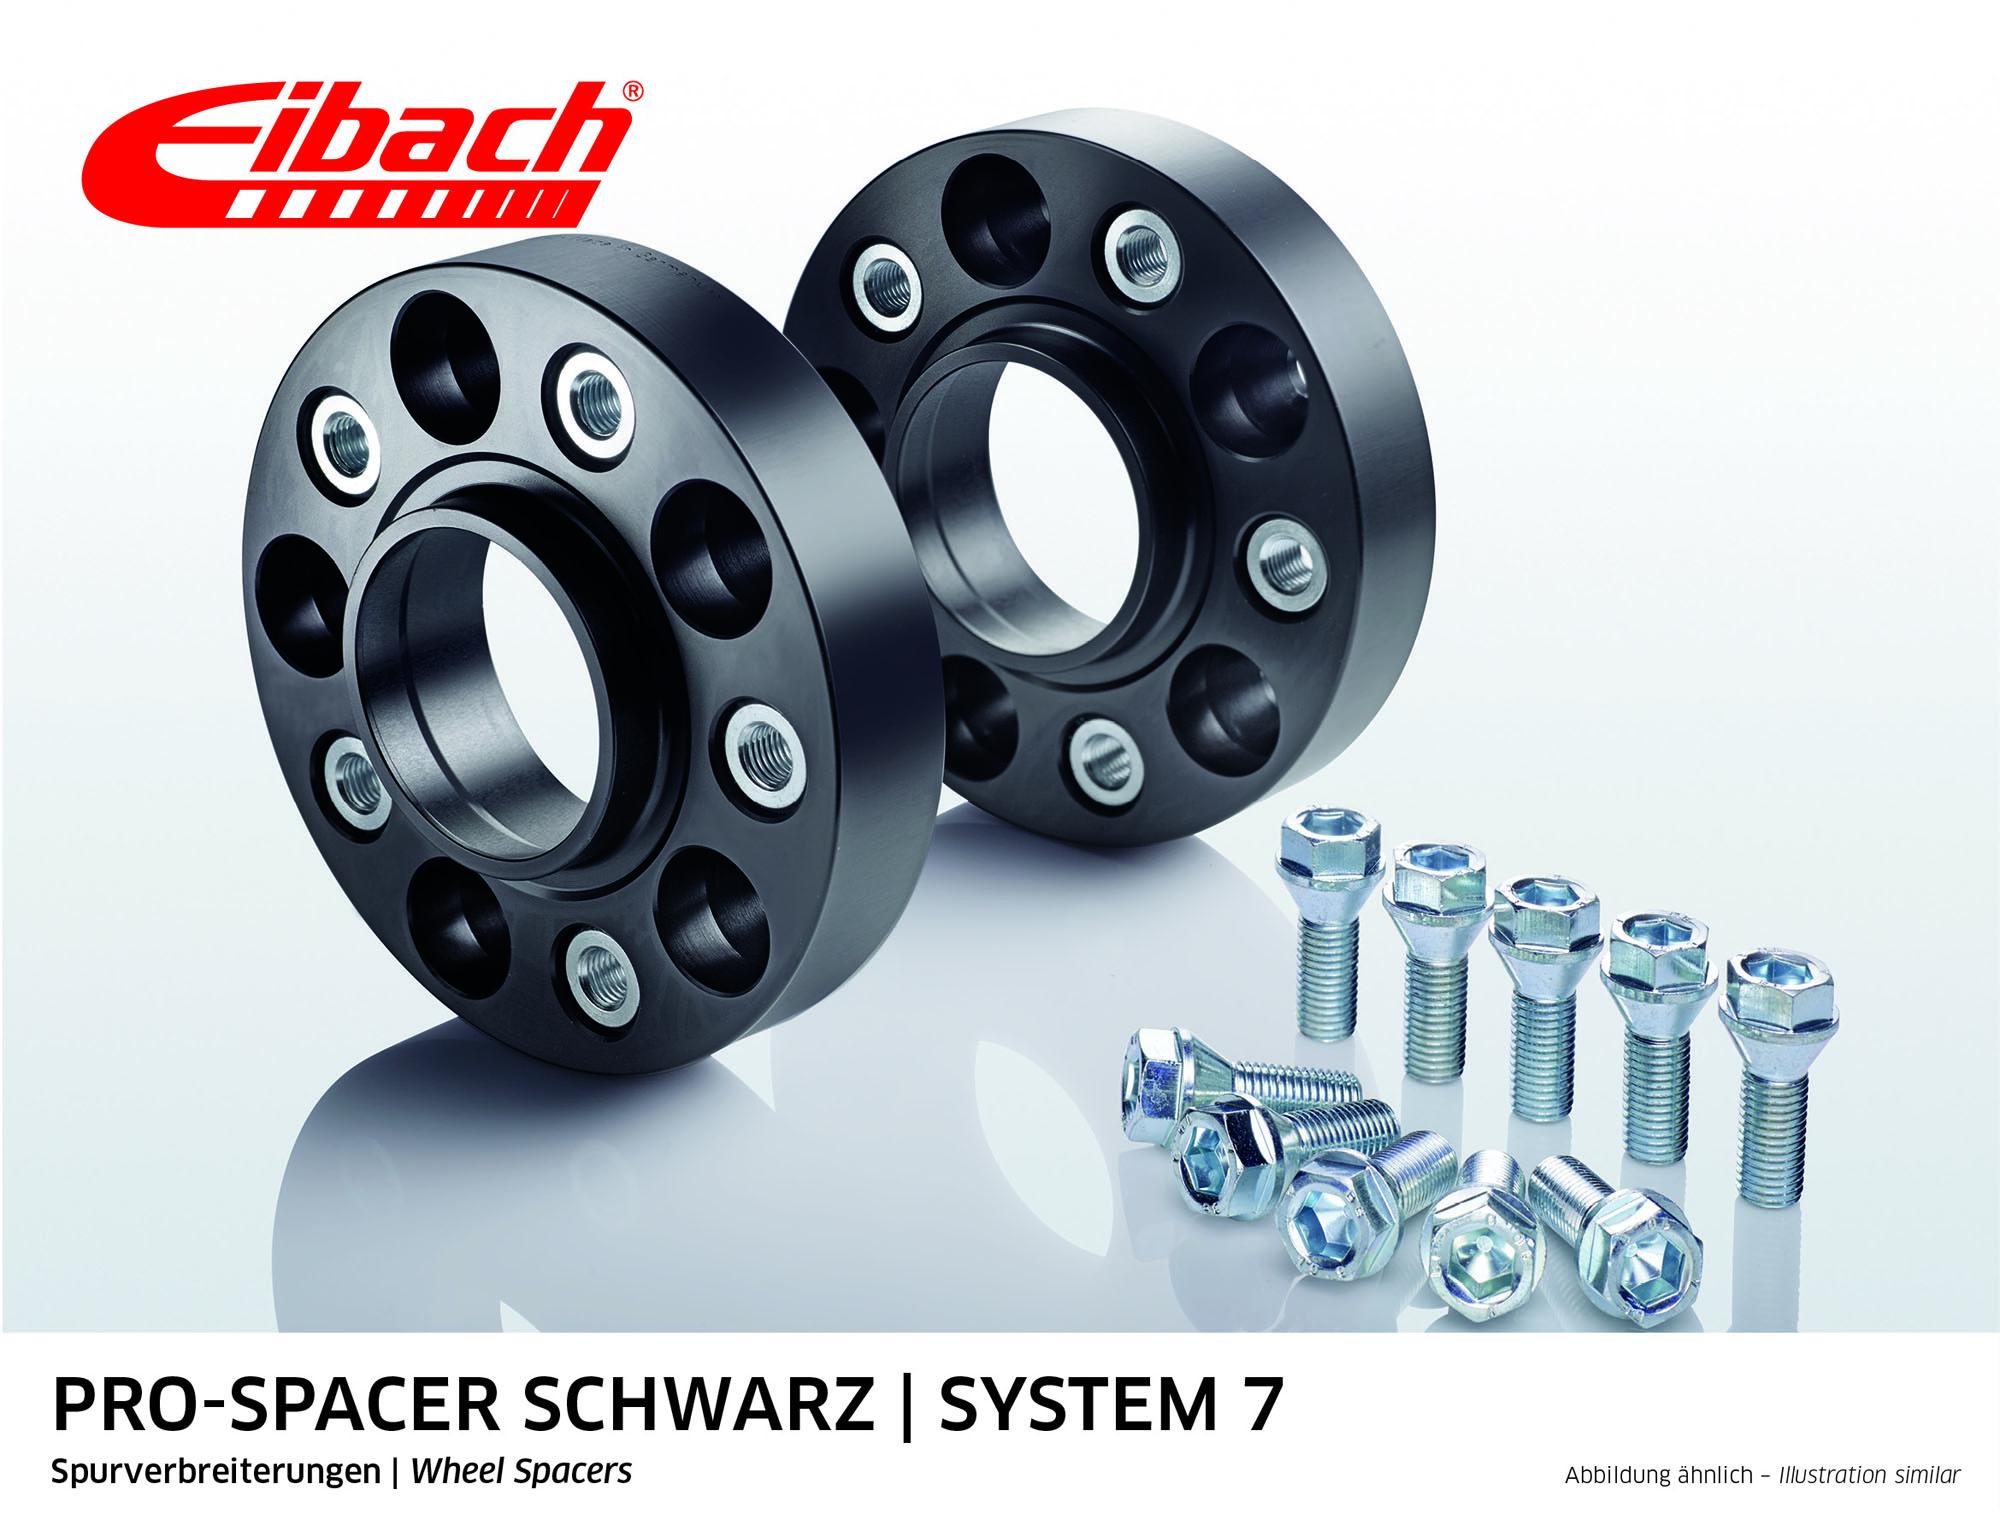 Eibach S90-4-25-015 Pro-Spacer